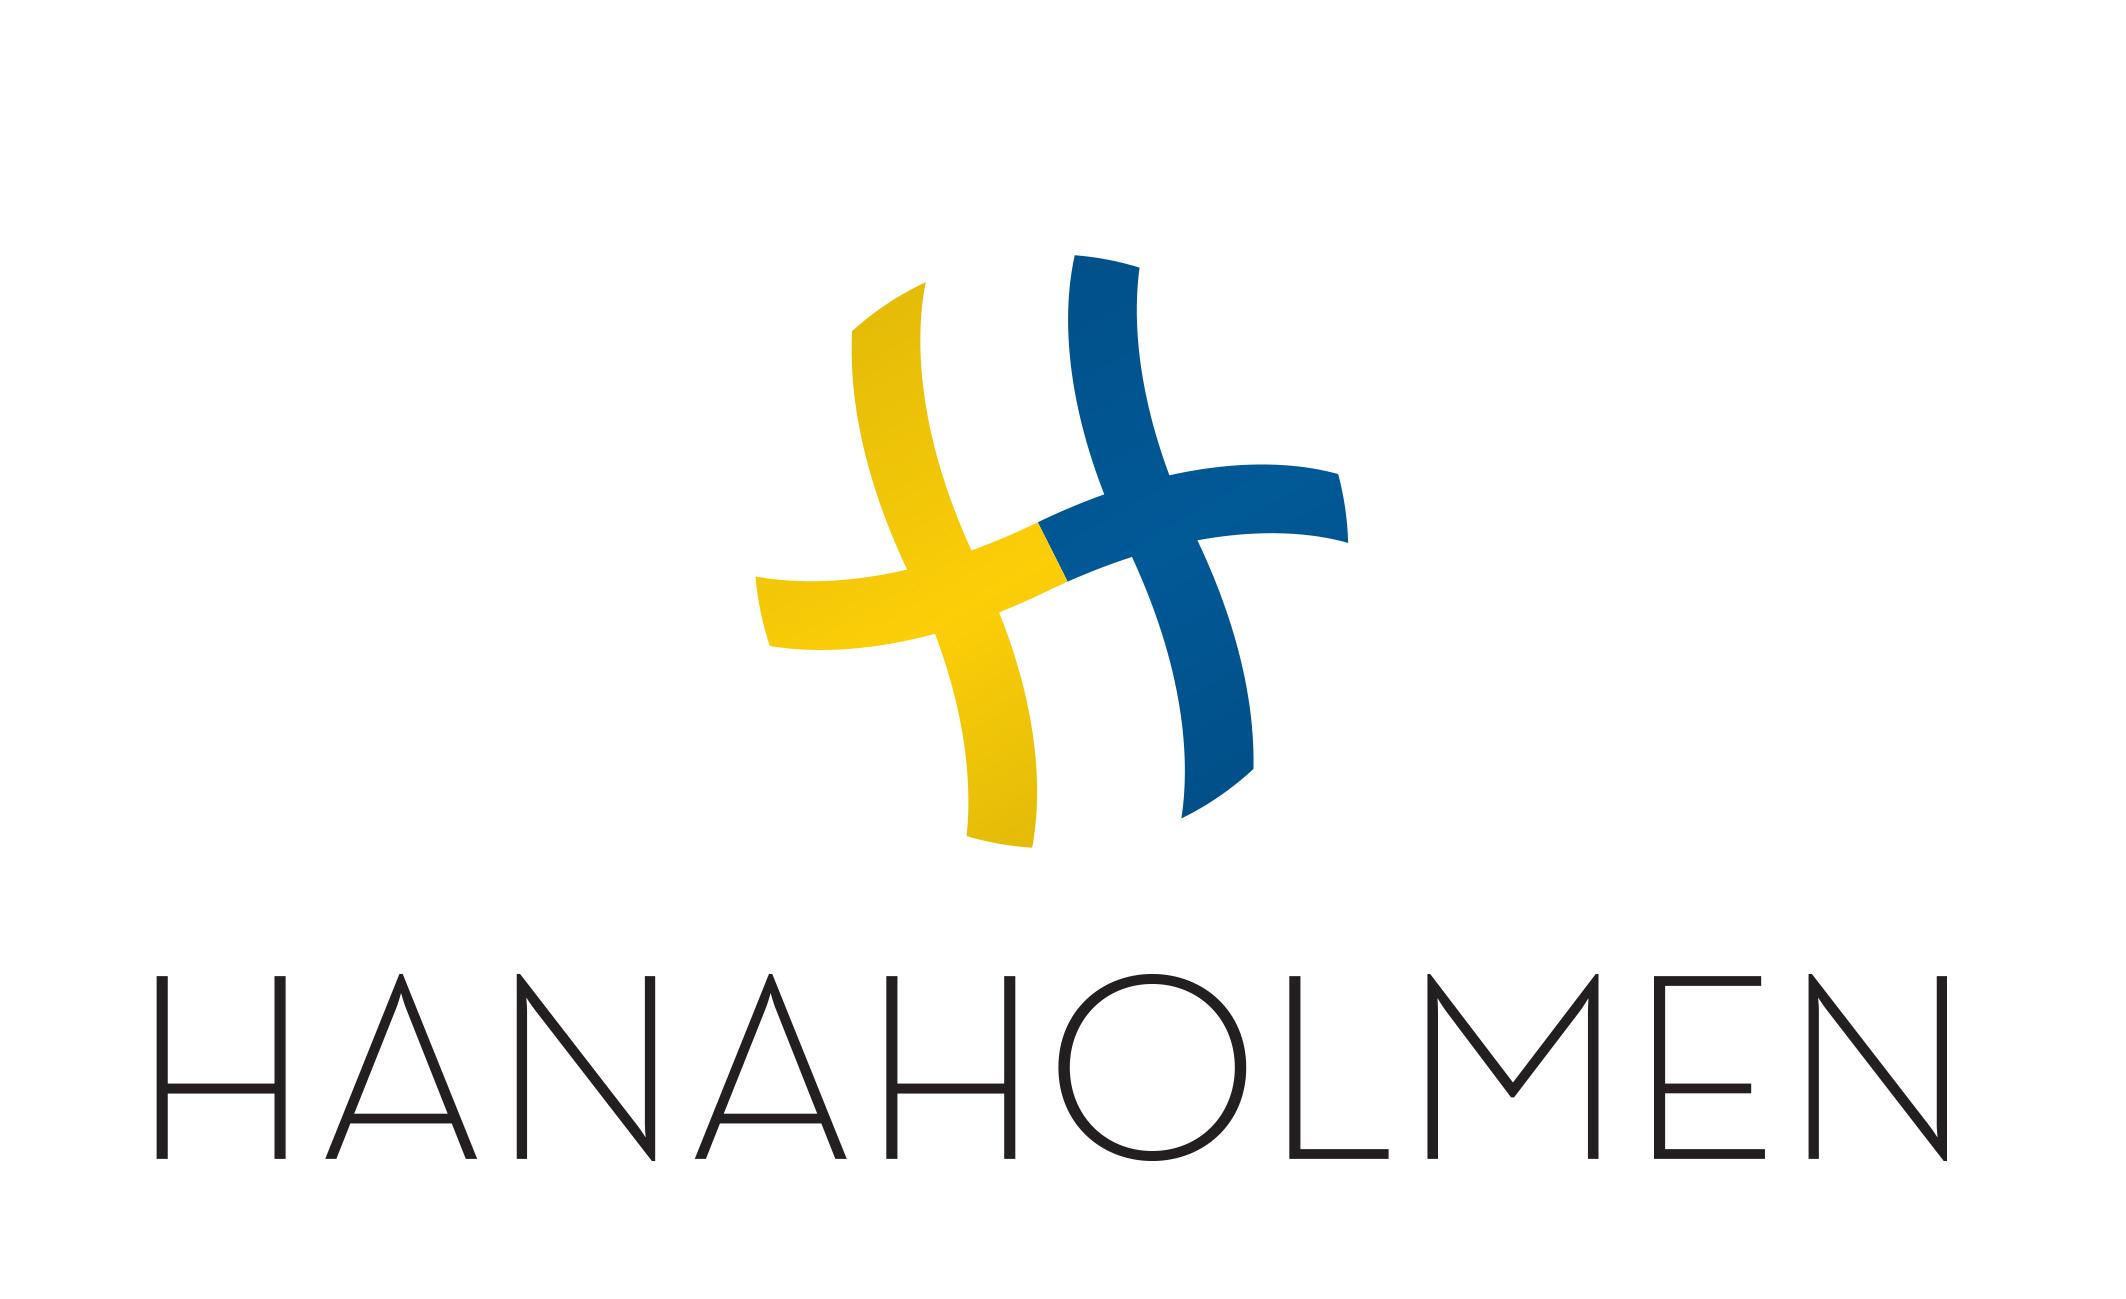 Hanasaari – Hanaholmen